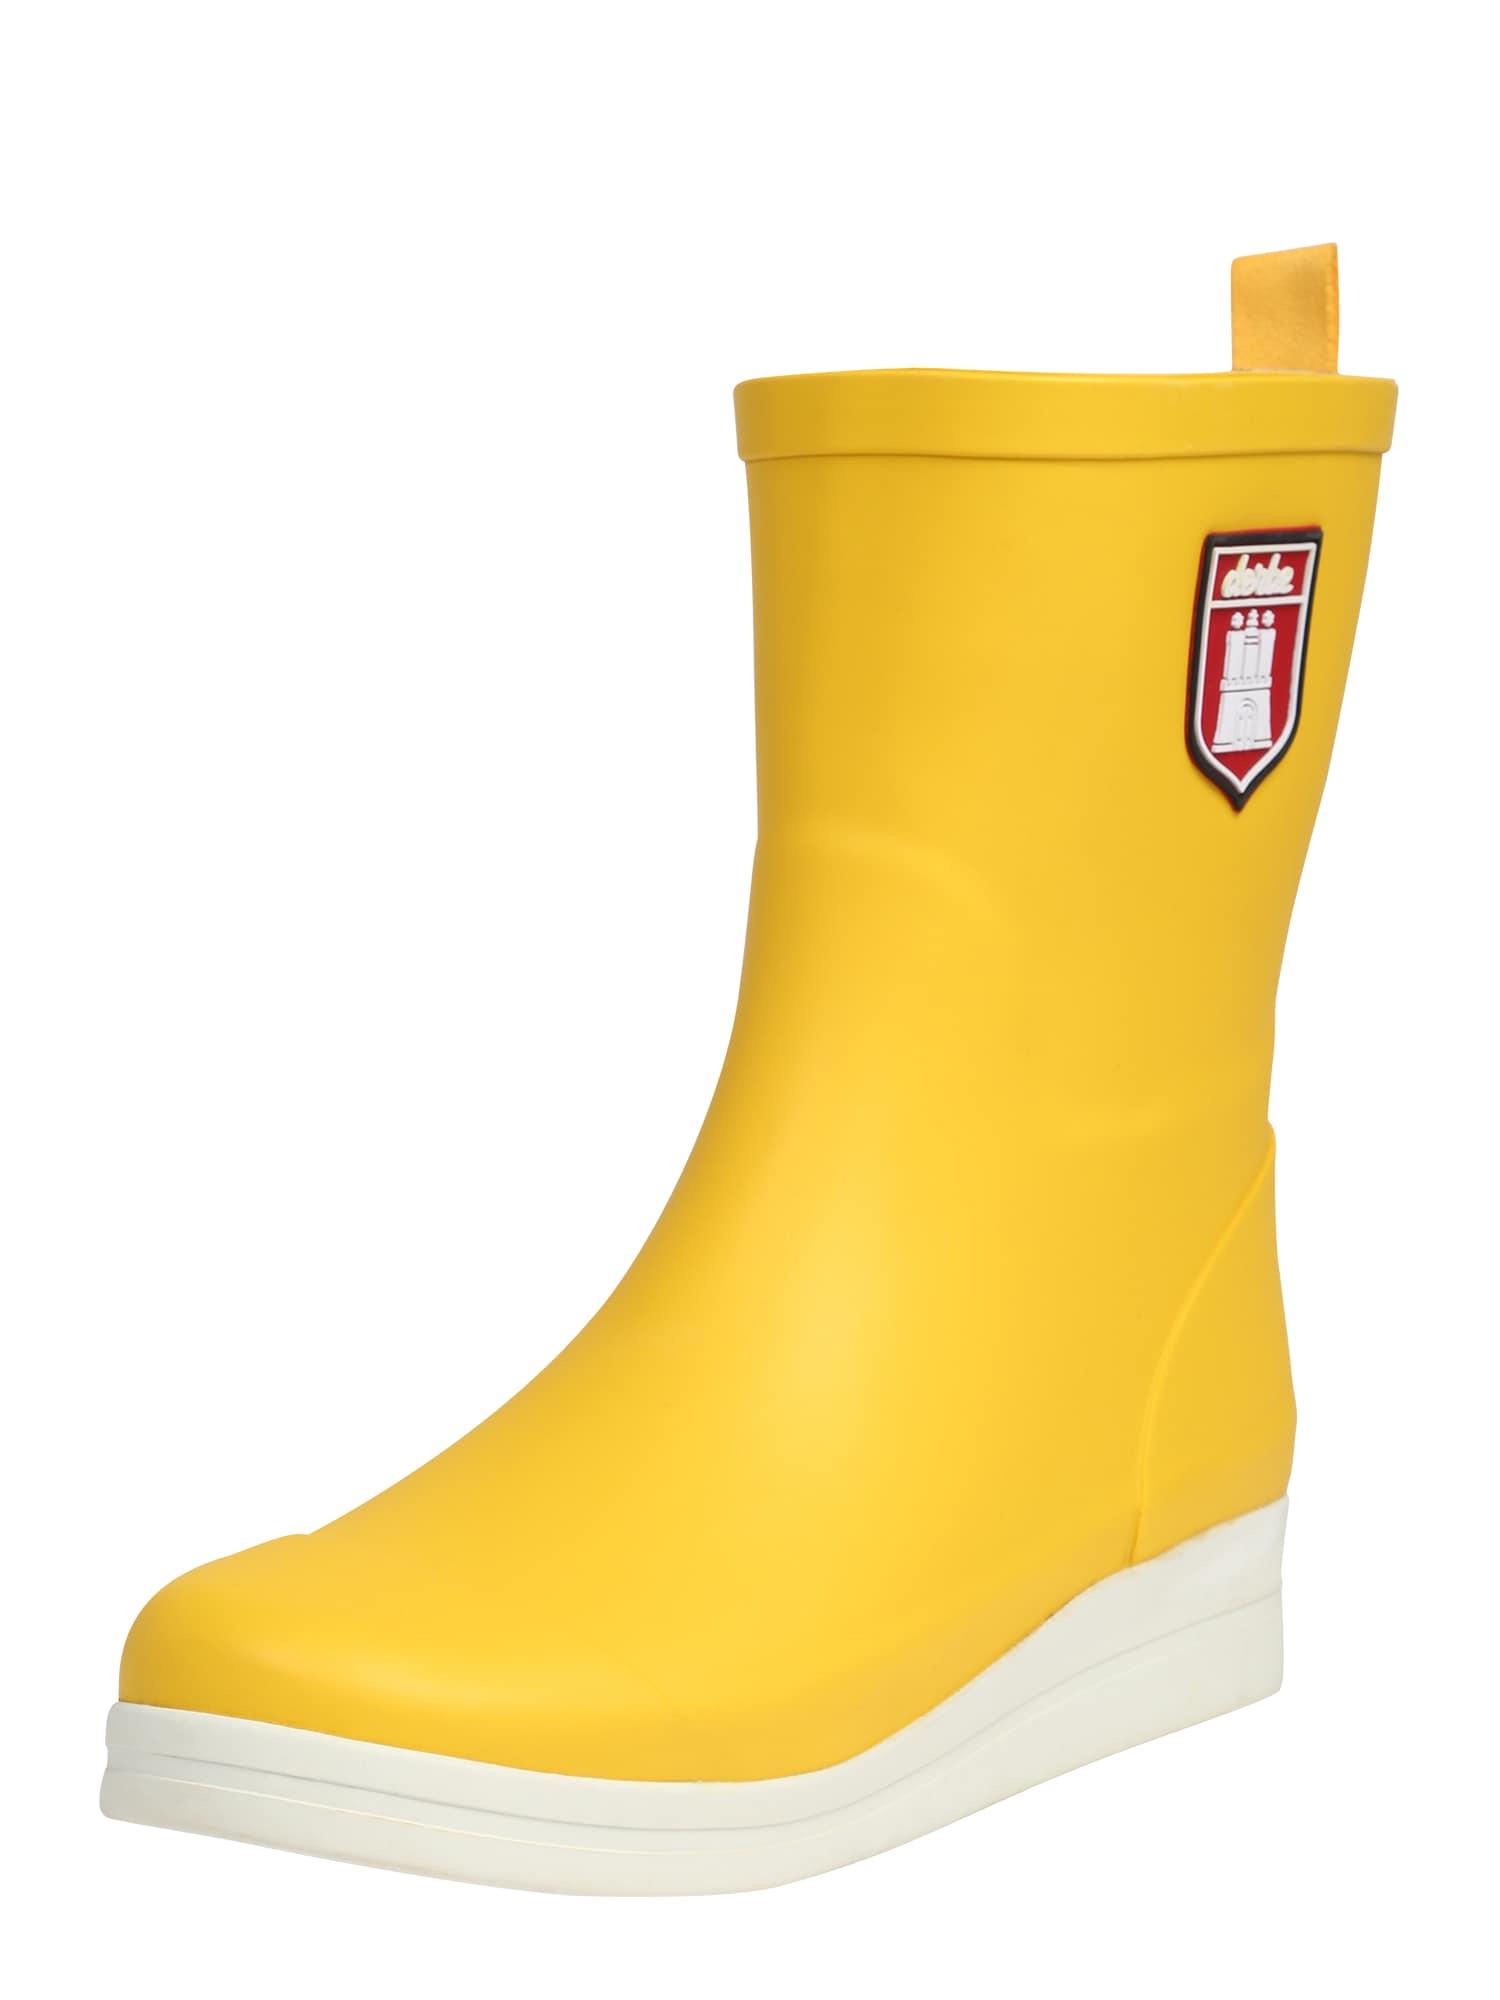 Holínky Shietwedderbotten žlutá Derbe